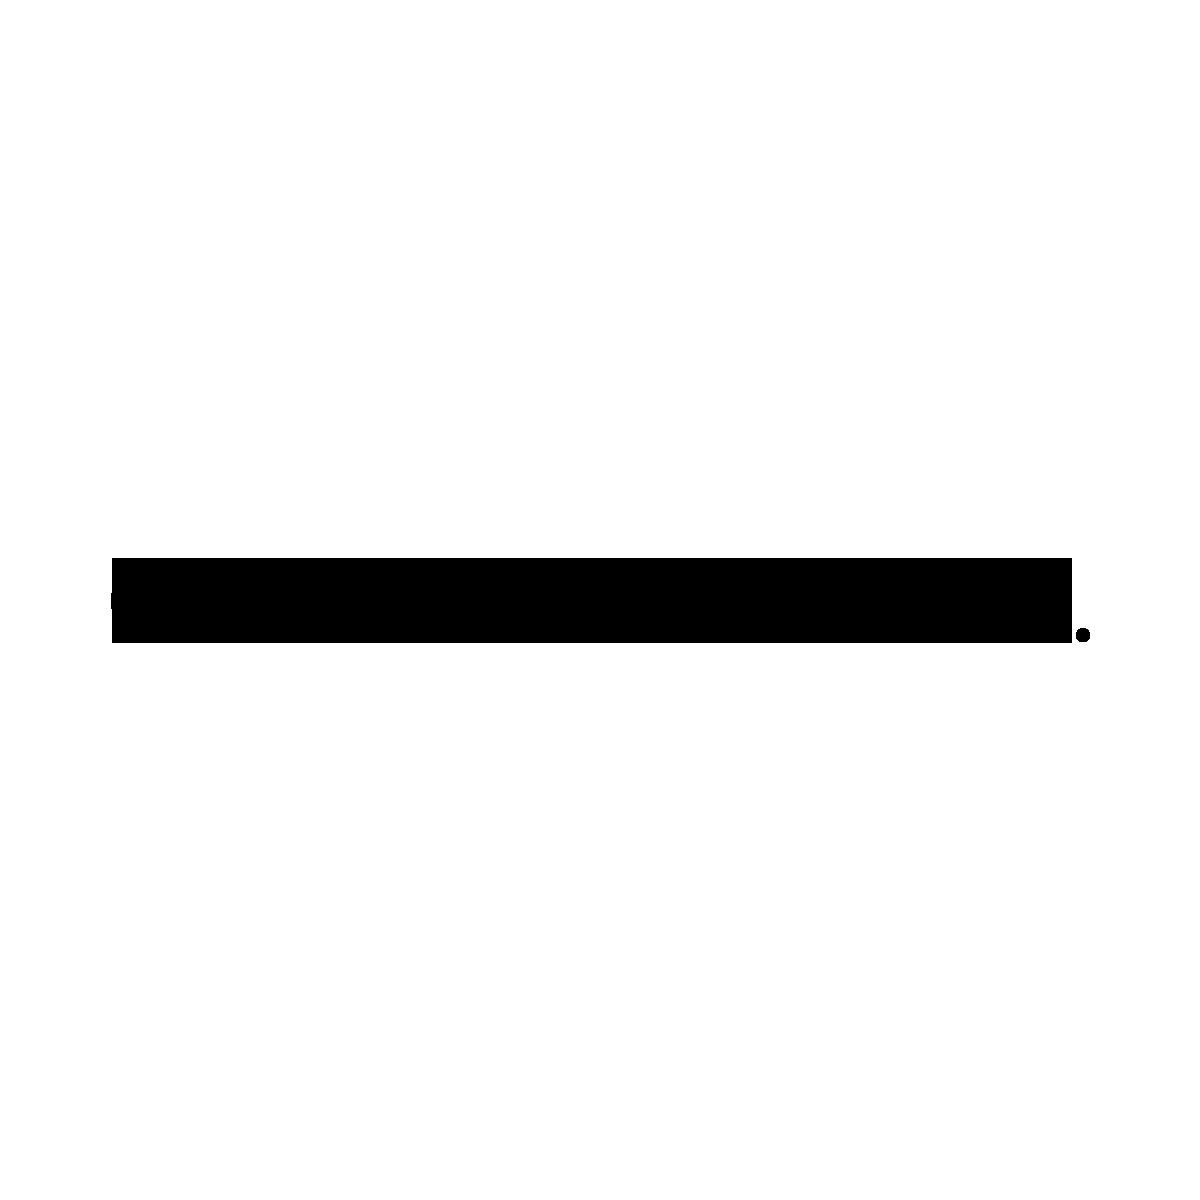 Brown leather sandal fred de la bretoniere 170010009 detail sole